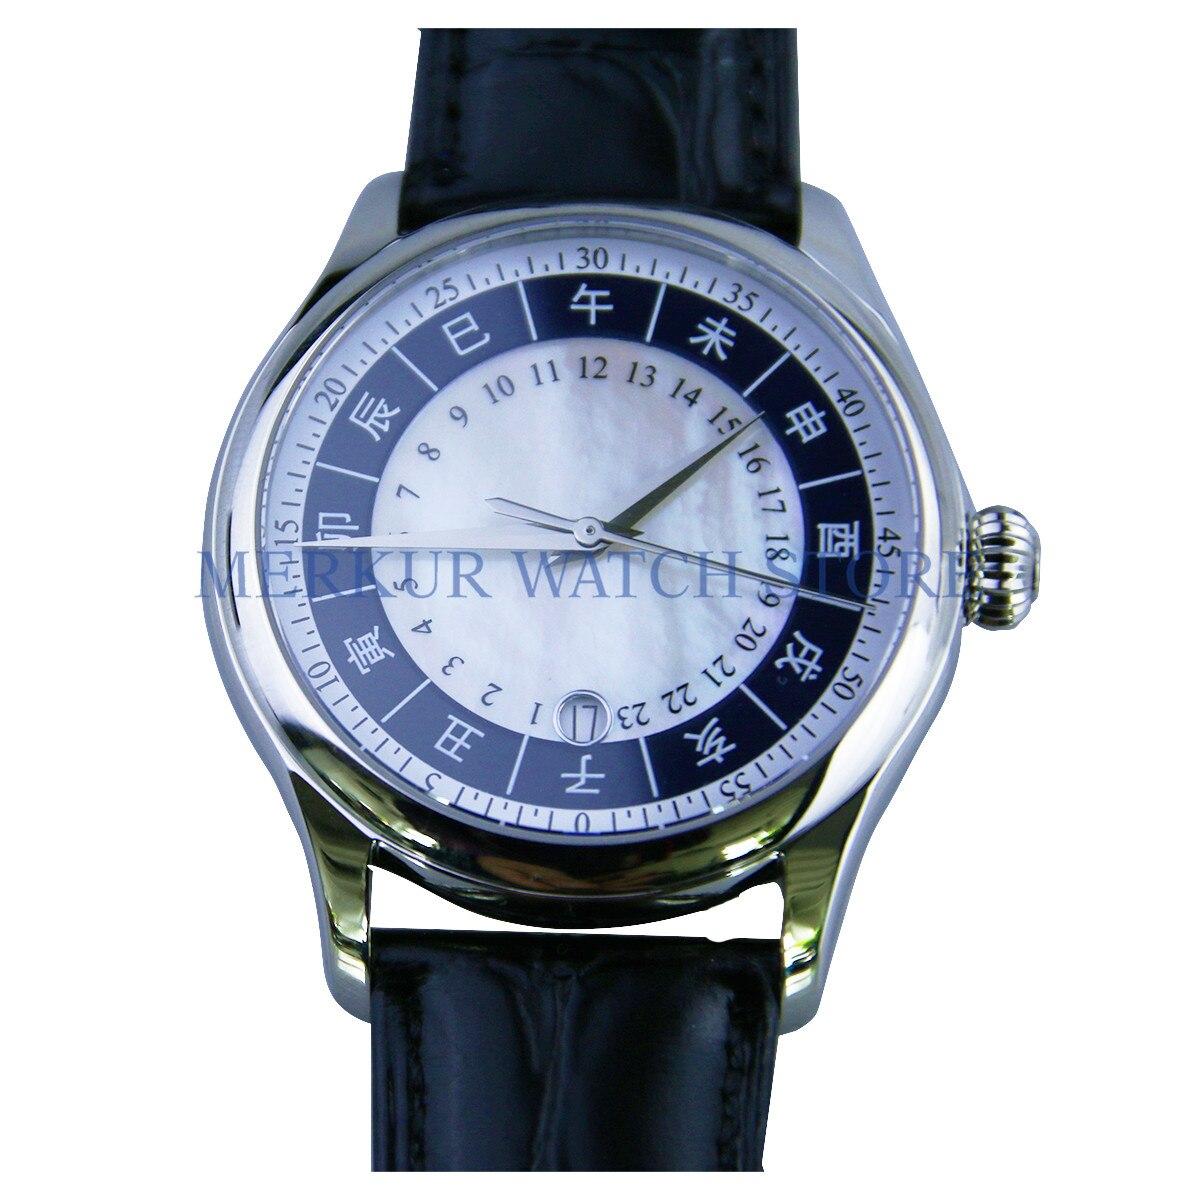 BOND TianJin St2130 movimiento hombres calendario mecánico reloj de pulsera vestido